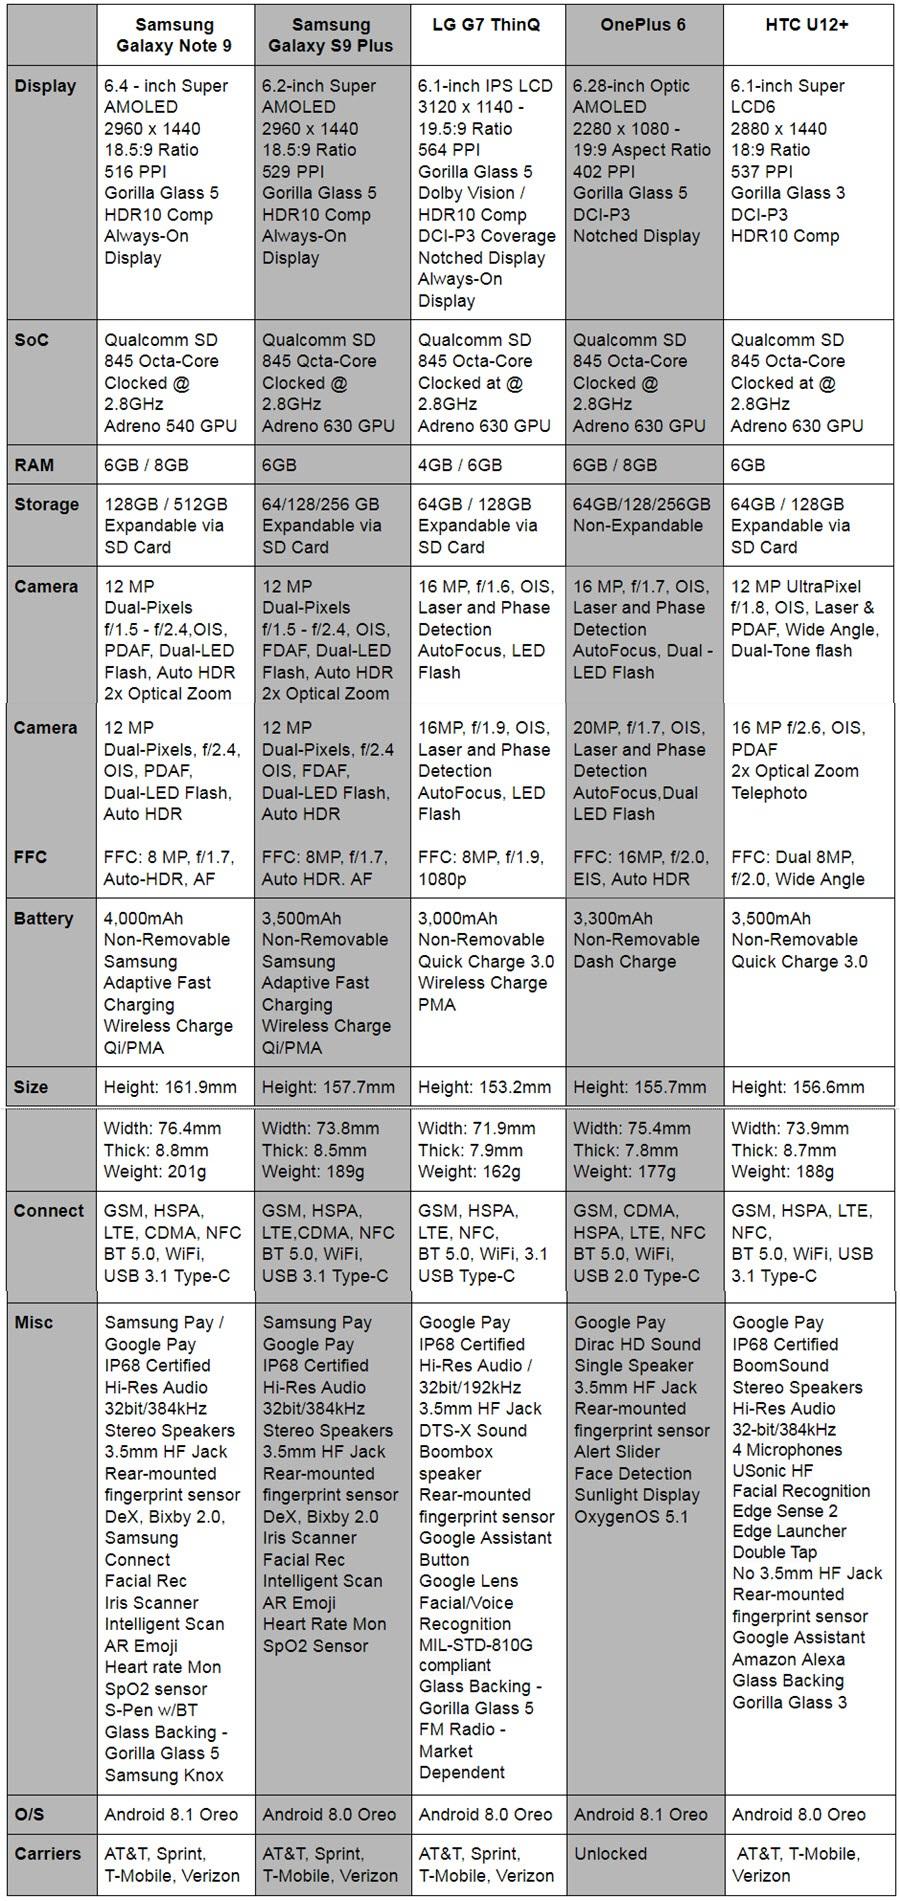 Phone Comparisons: Samsung Galaxy Note 9 vs Galaxy S9+ vs LG G7 ThinQ vs OnePlus 6 vs HTC U12+